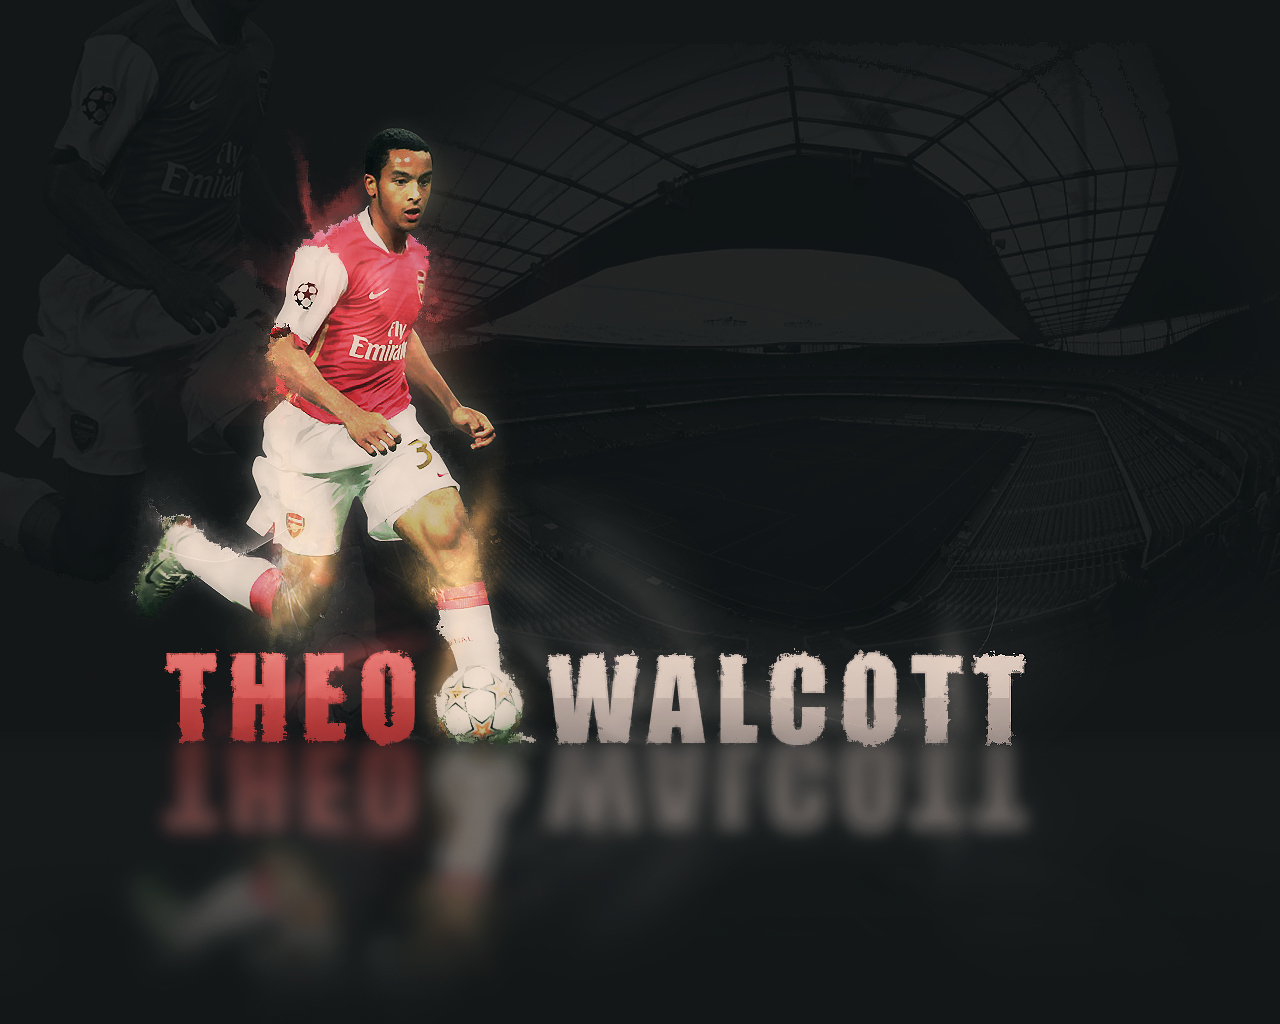 http://1.bp.blogspot.com/-UoiAX5Hbwuo/T84i1uDifzI/AAAAAAAACVM/9HyzuIua6y8/s1600/Theo-Walcott-2.jpg